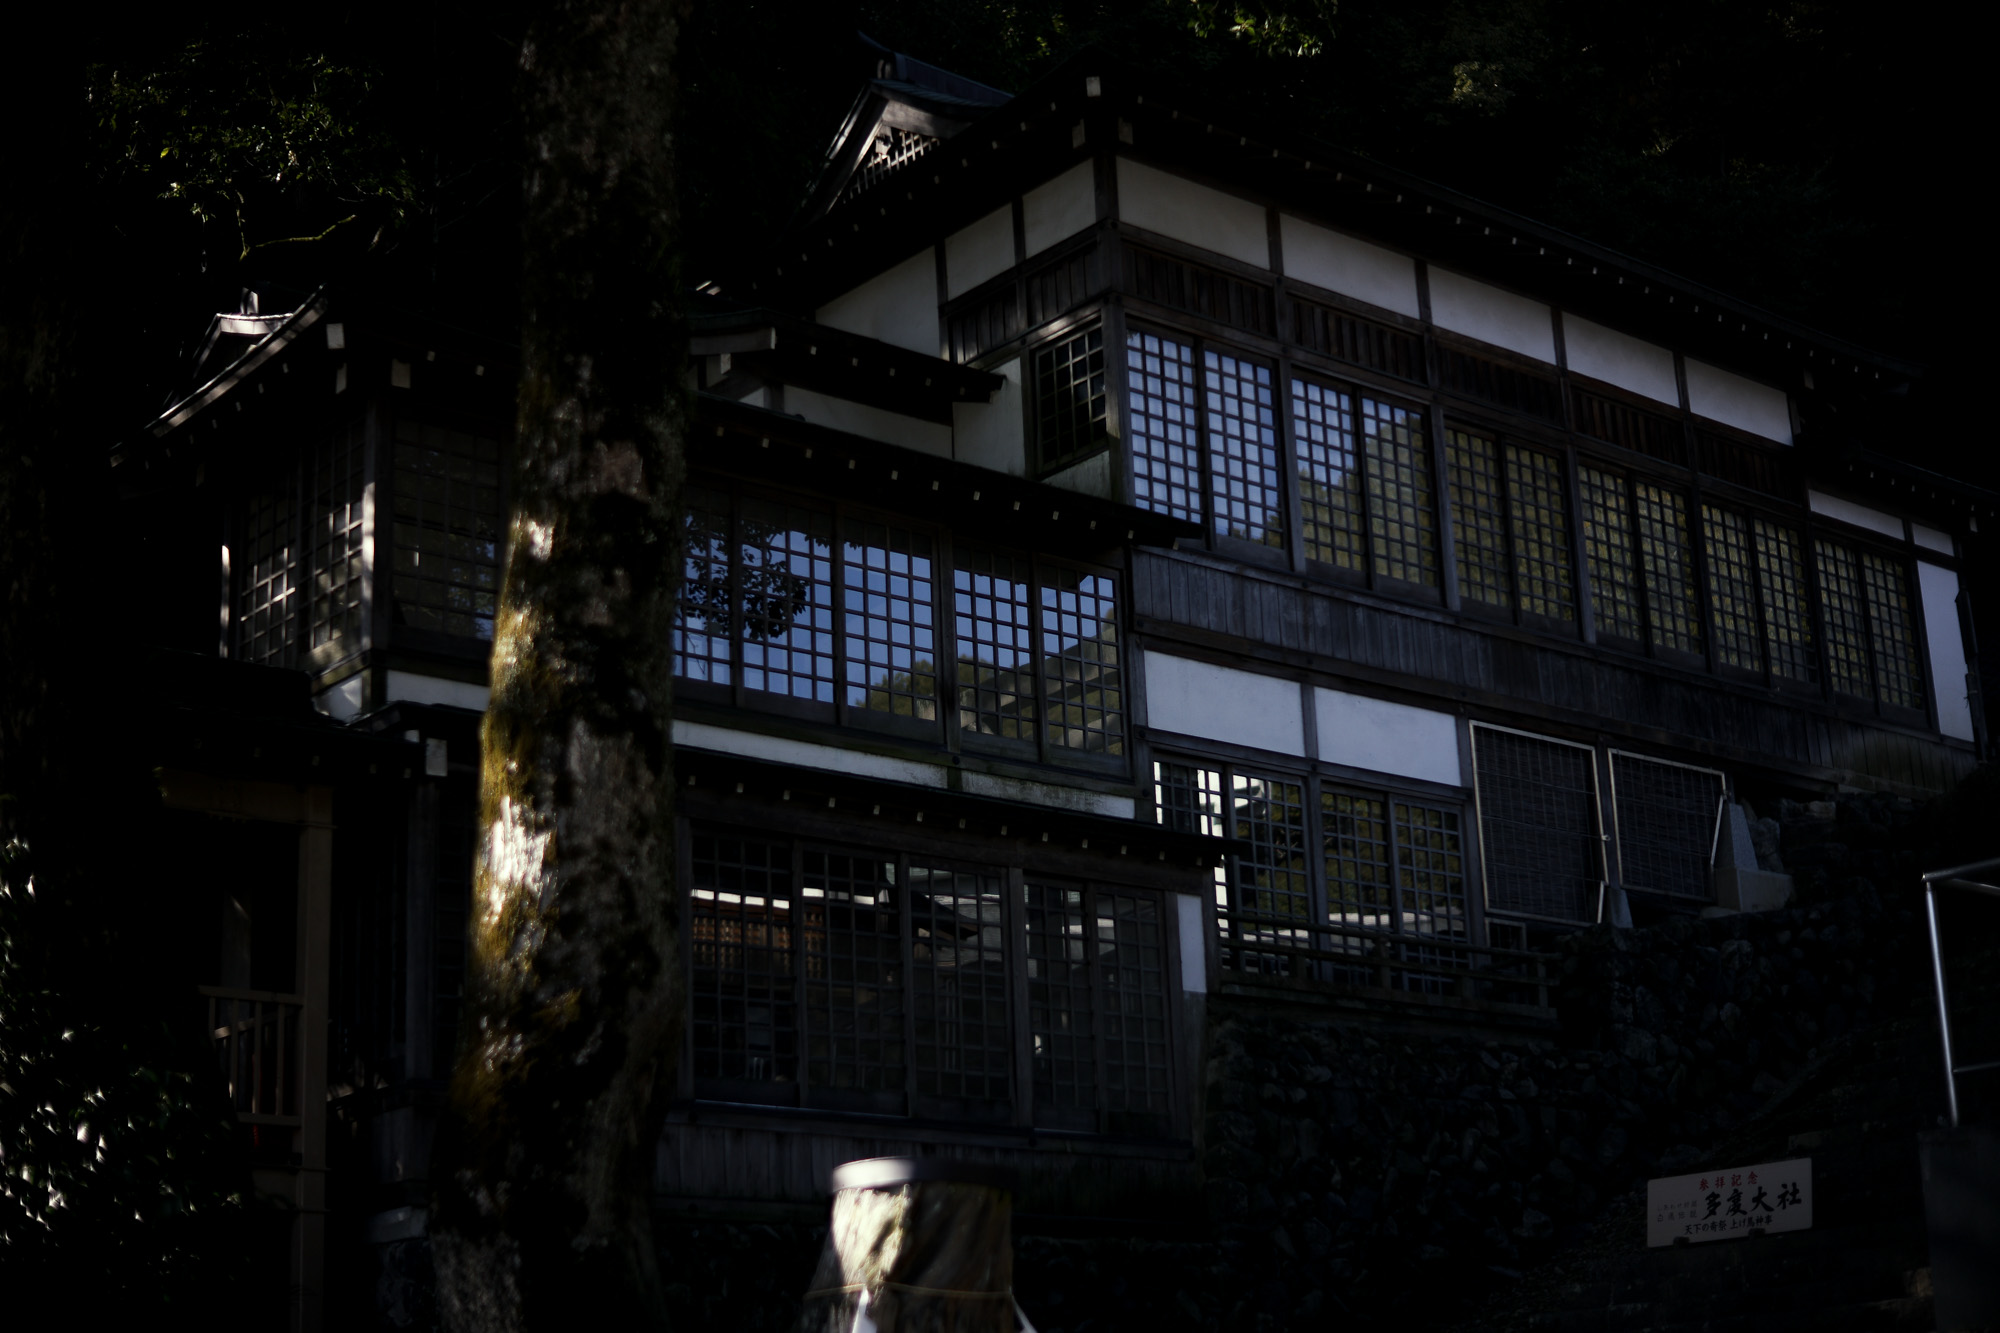 LEICA NOCTILUX-M 50 f/1.2 ASPH. 2021年2月28日 発売 LEICA NOCTILUX-M 50 f/1.2 ASPH. ライカ ノクティルックス オールドレンズ 銘玉 オールドレンズ ライカノクティルックス-M 50 f/1.2 ASPH.  多度大社 三重県桑名市多度町多度 上げ馬 LEICA ライカ LEICA M10-P ASC100 EDITION ASC Cine Classic モード